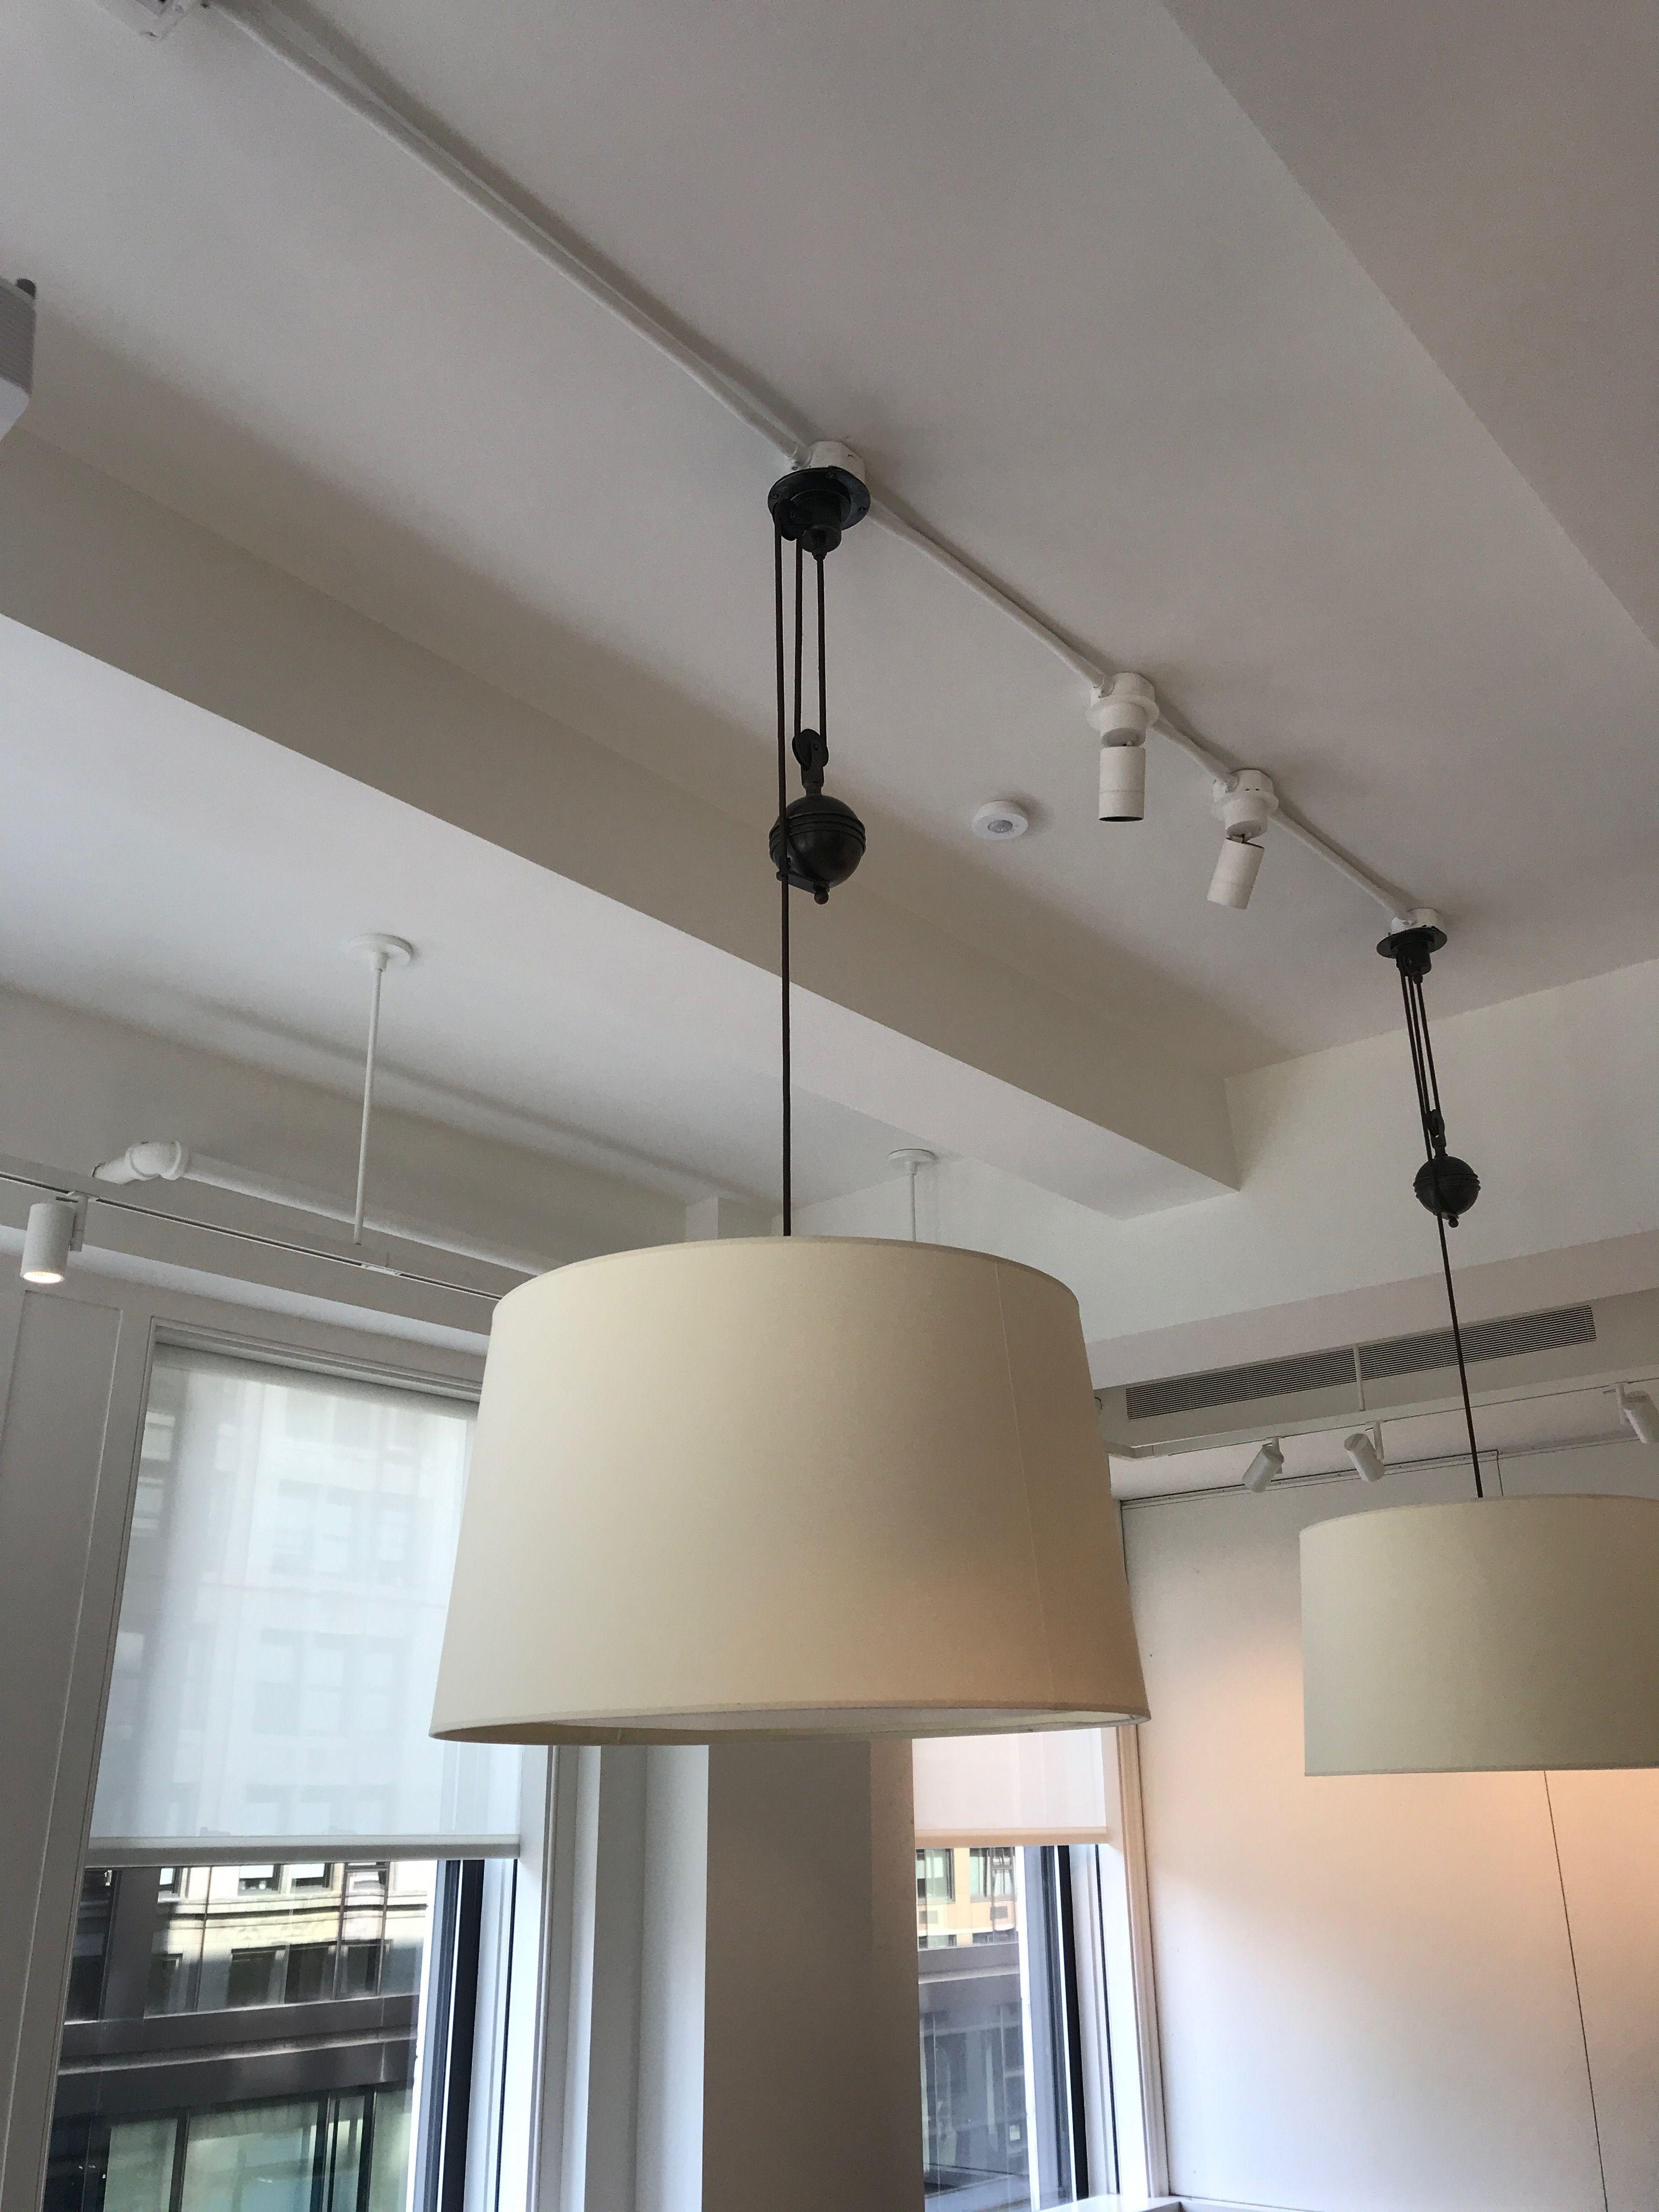 Low Hanging Lights